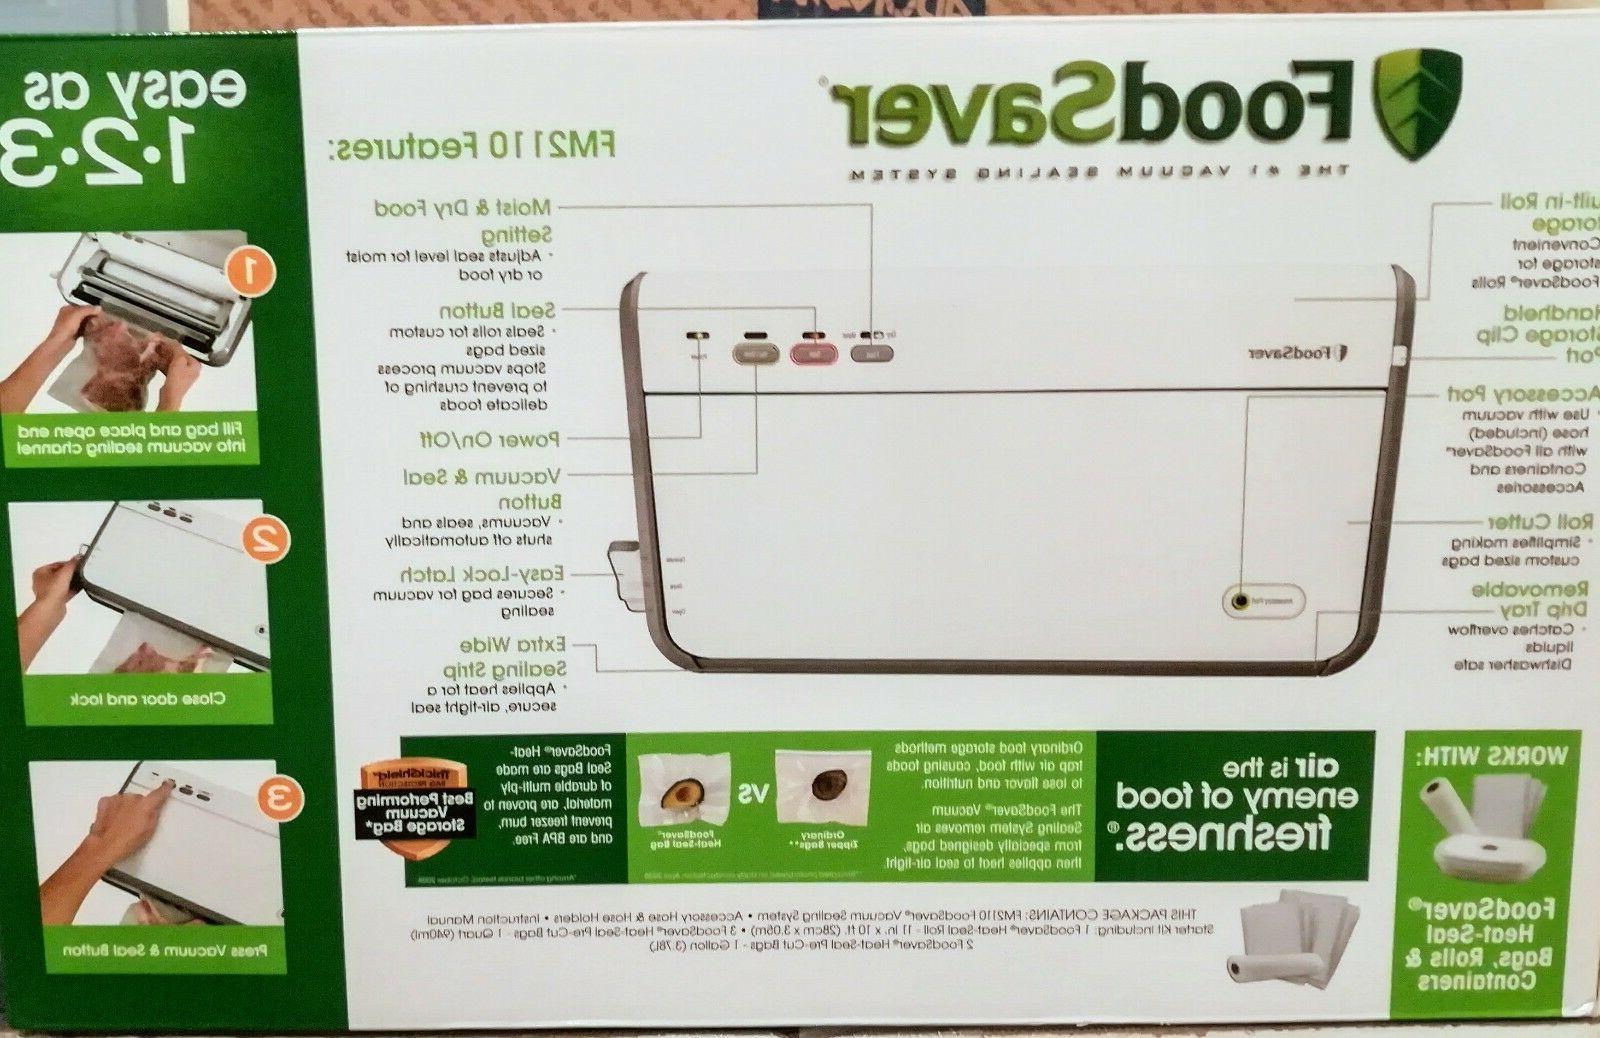 FoodSaver FM2110 Vacuum Sealing System